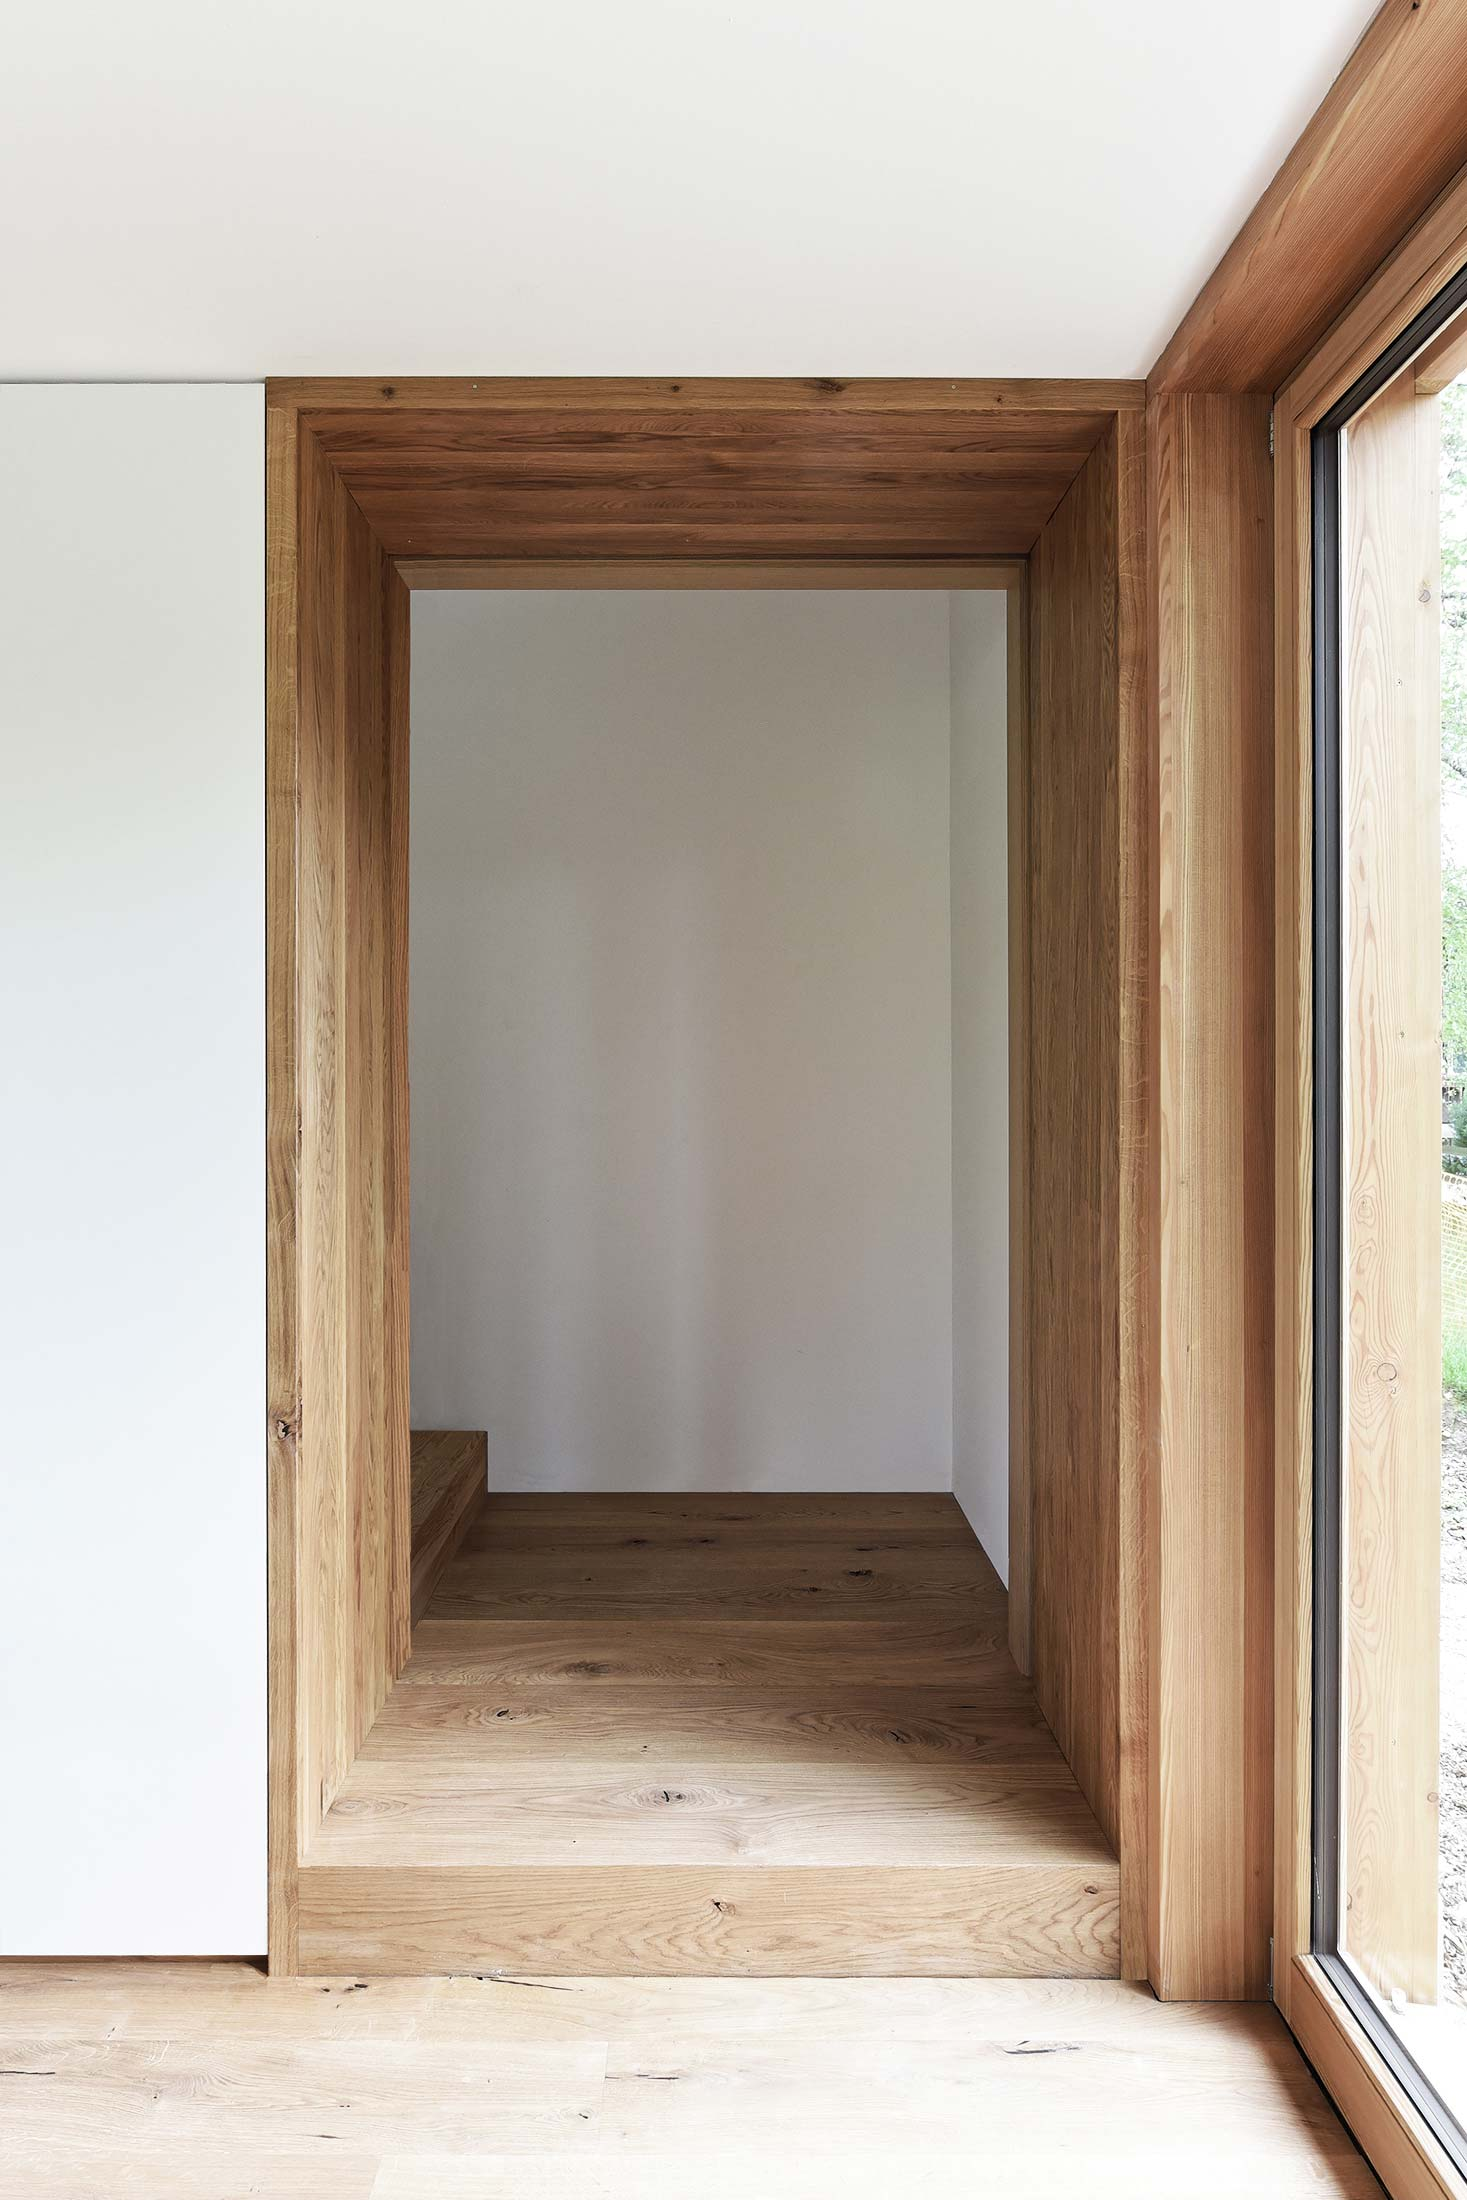 zimmerei-stoib-holzbau-holzhaus-modern-fassade-lärche-07.jpg